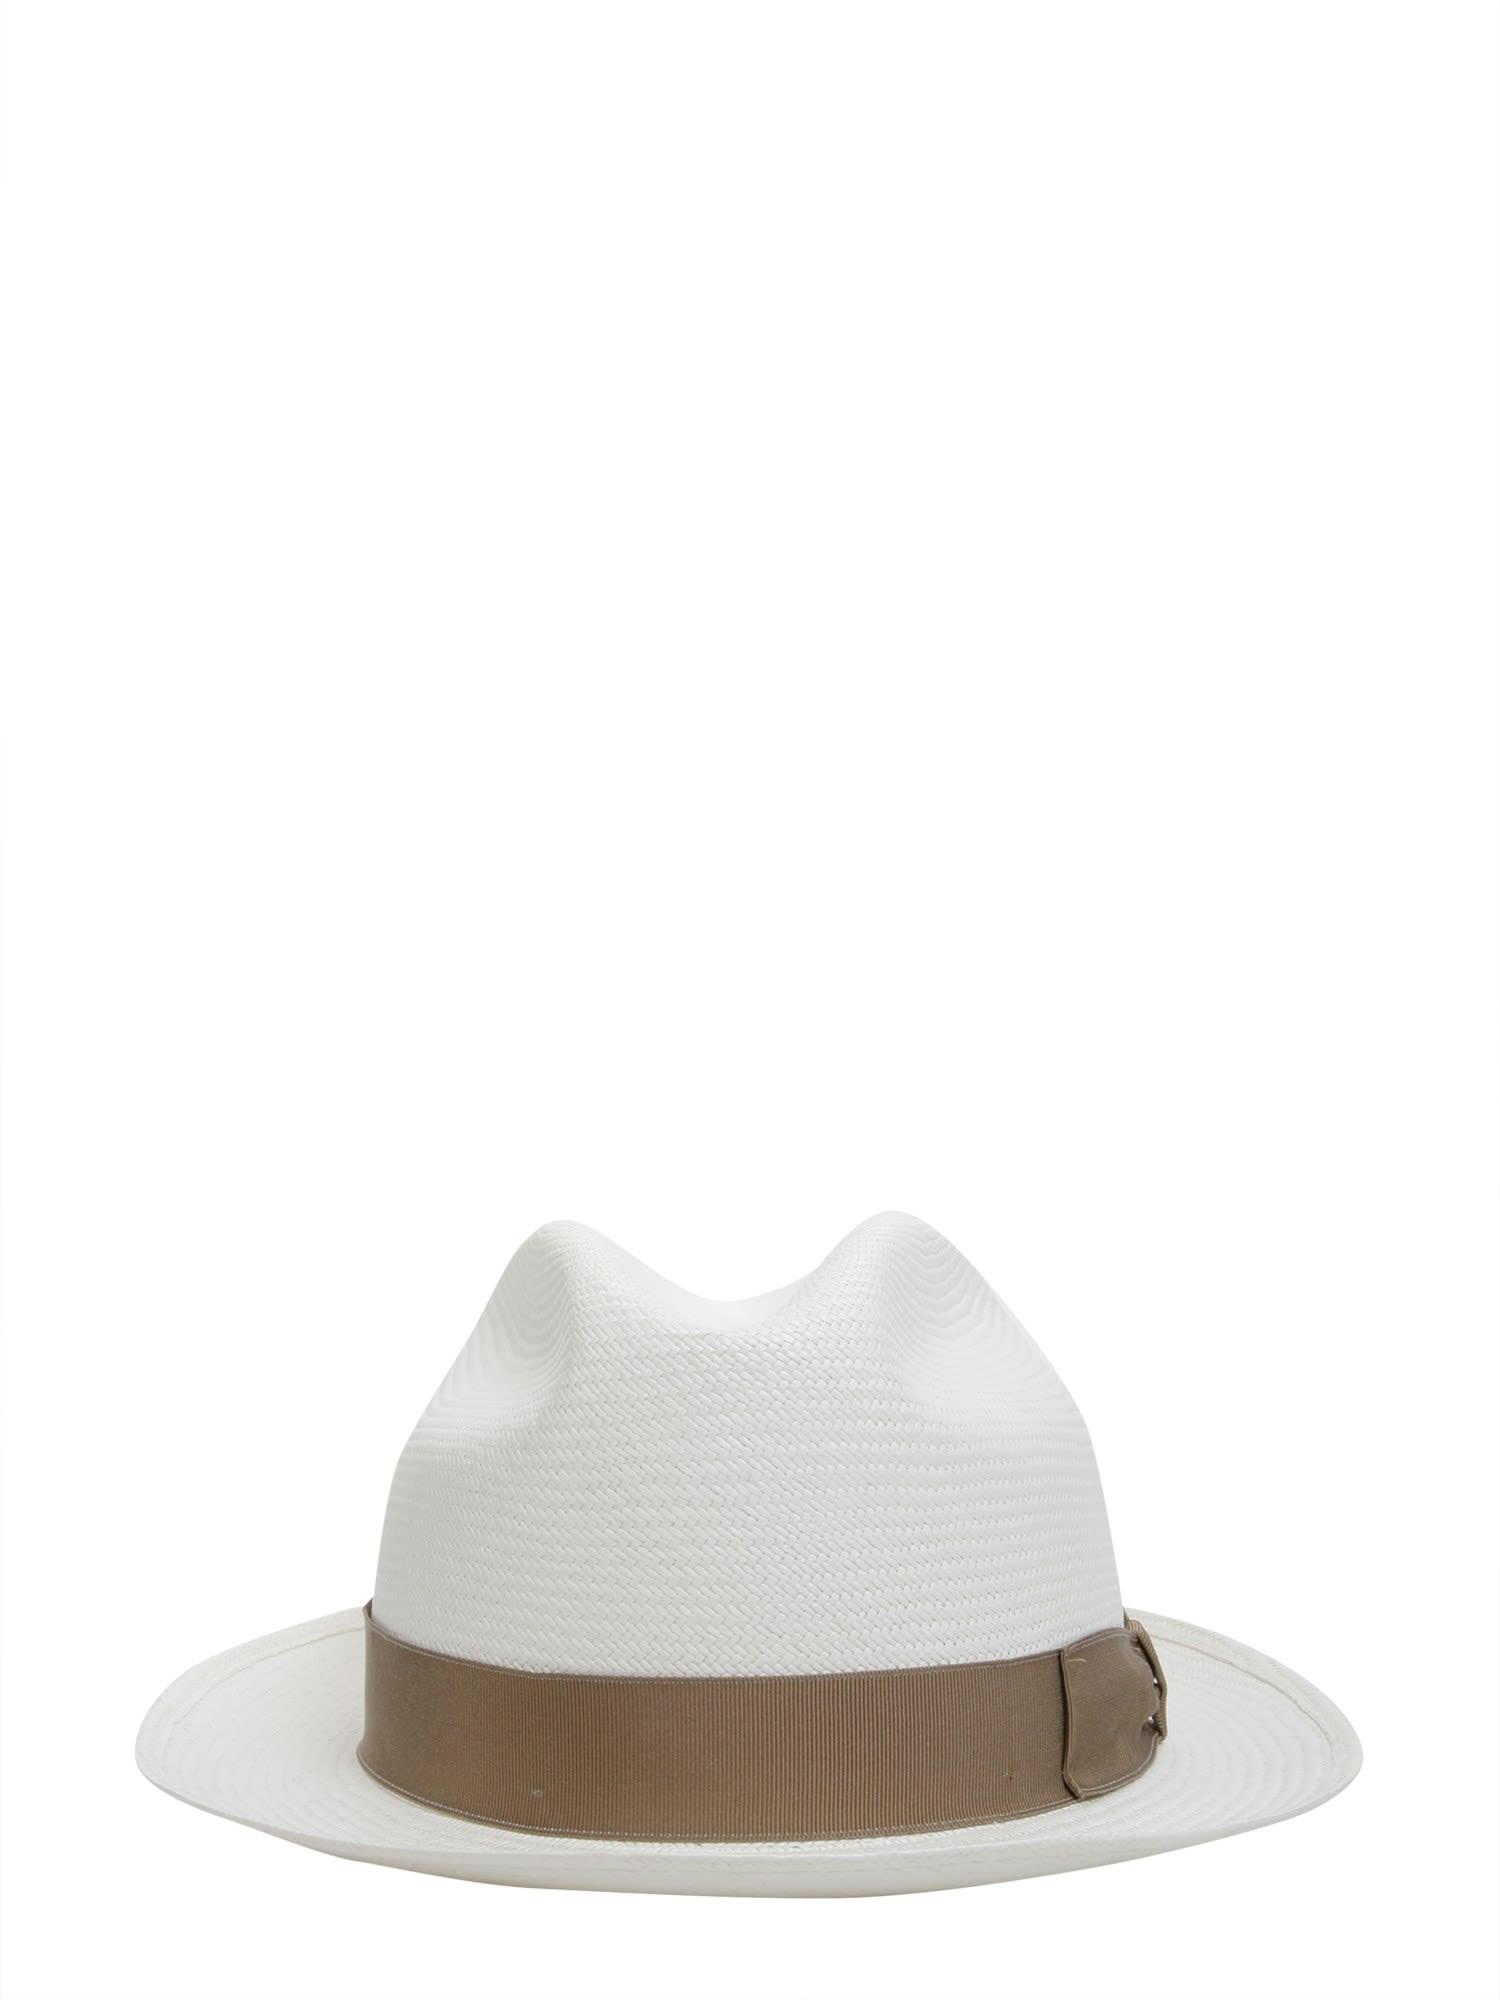 Borsalino Short Brim Panama Hat